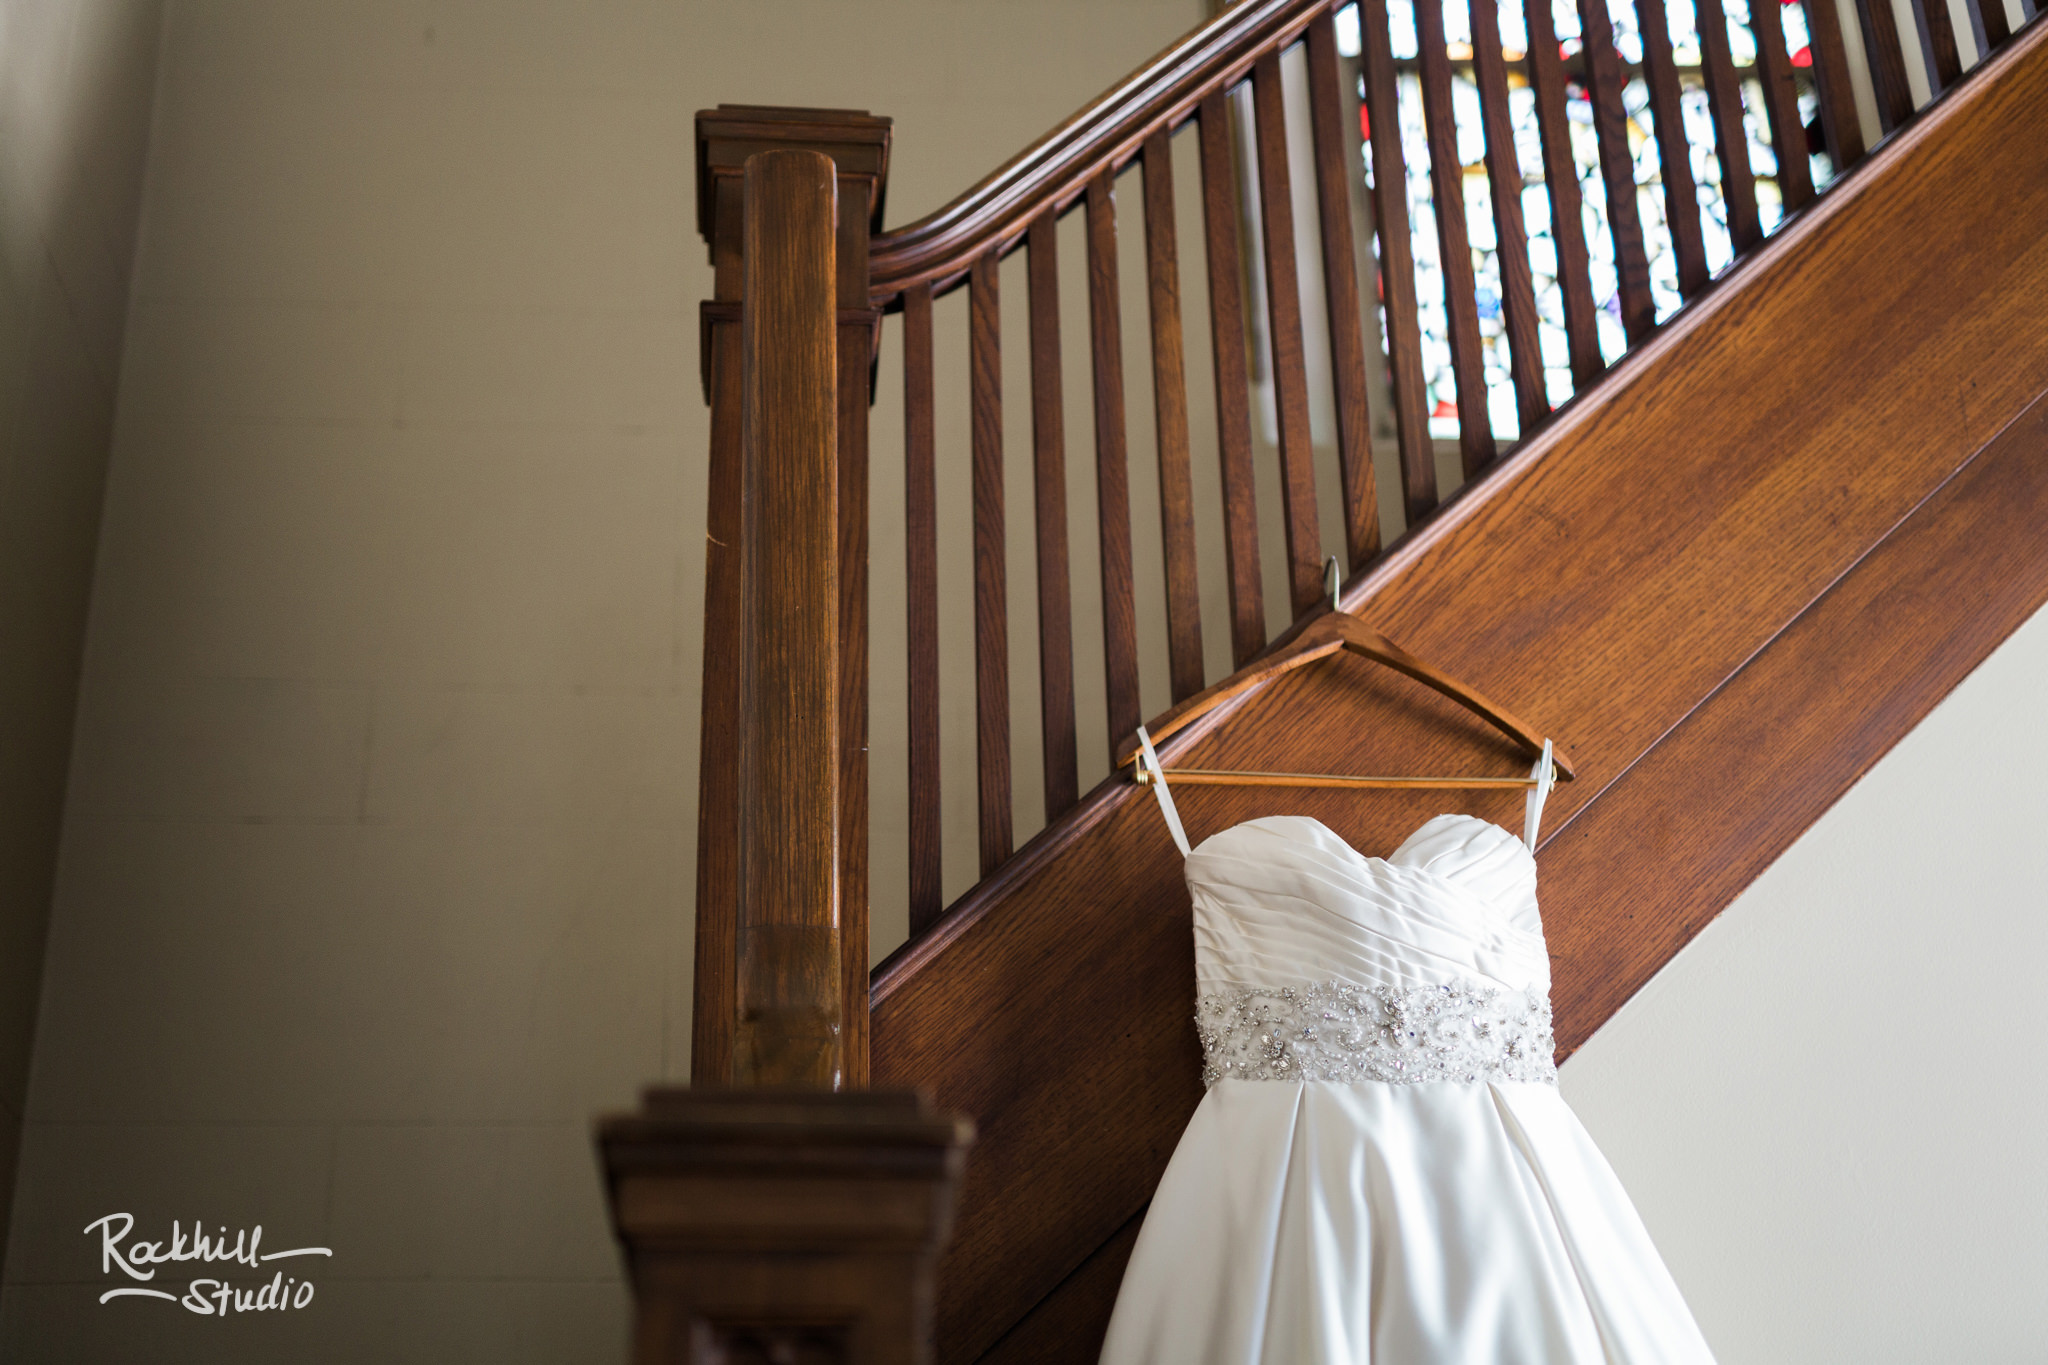 Grand rapids church wedding, wedding dress,traverse city wedding photographer Rockhill Studio